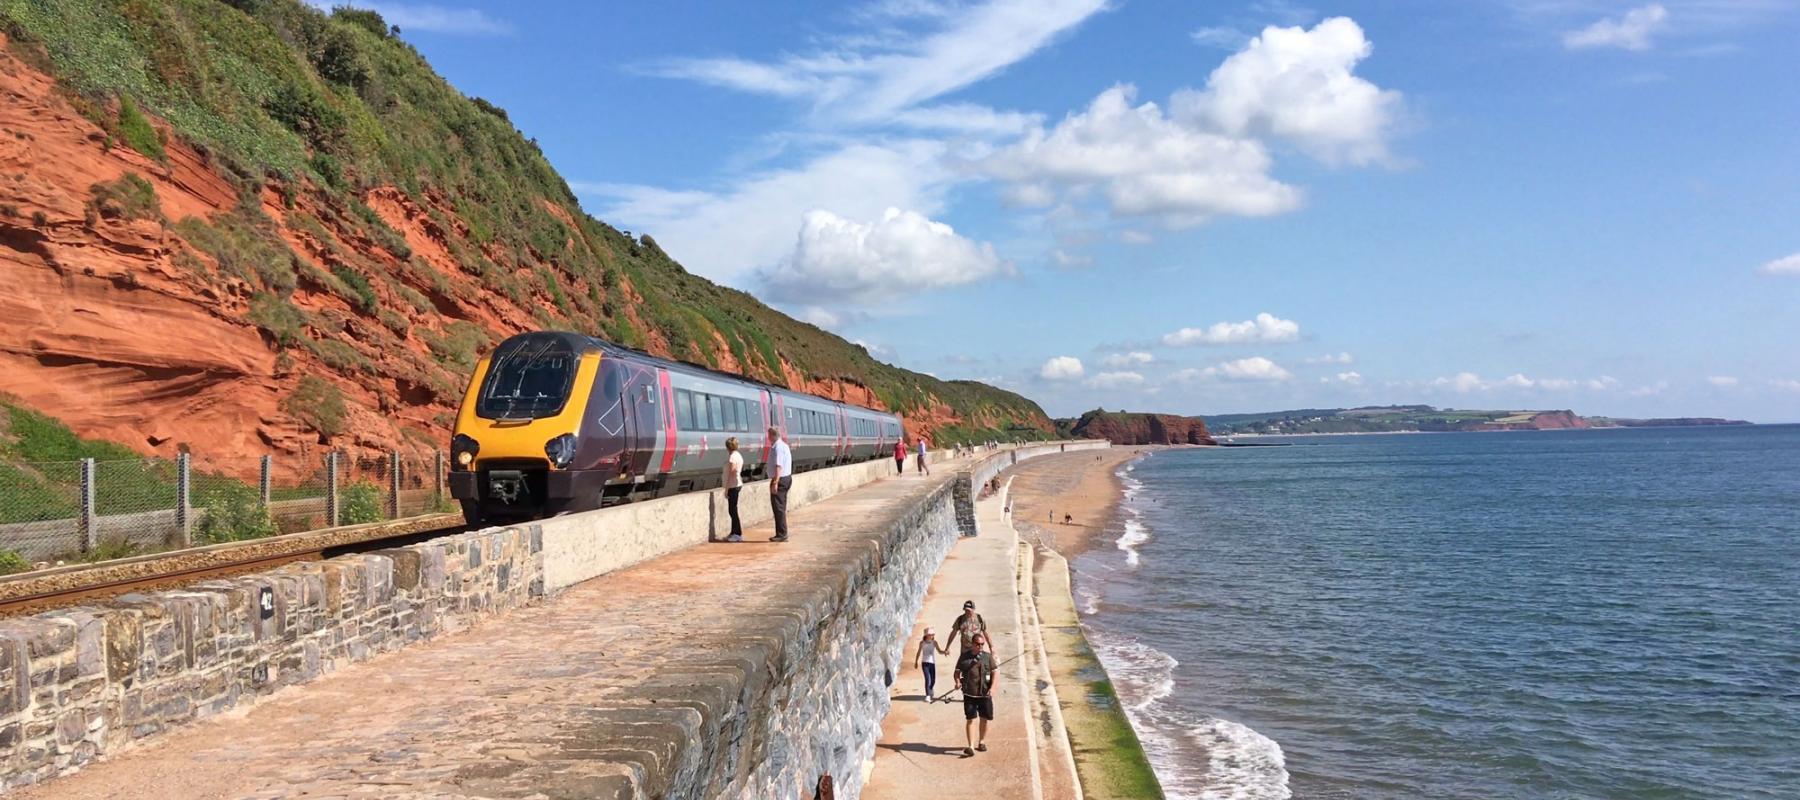 CrossCountry train on the sea wall approaching Dawlish station